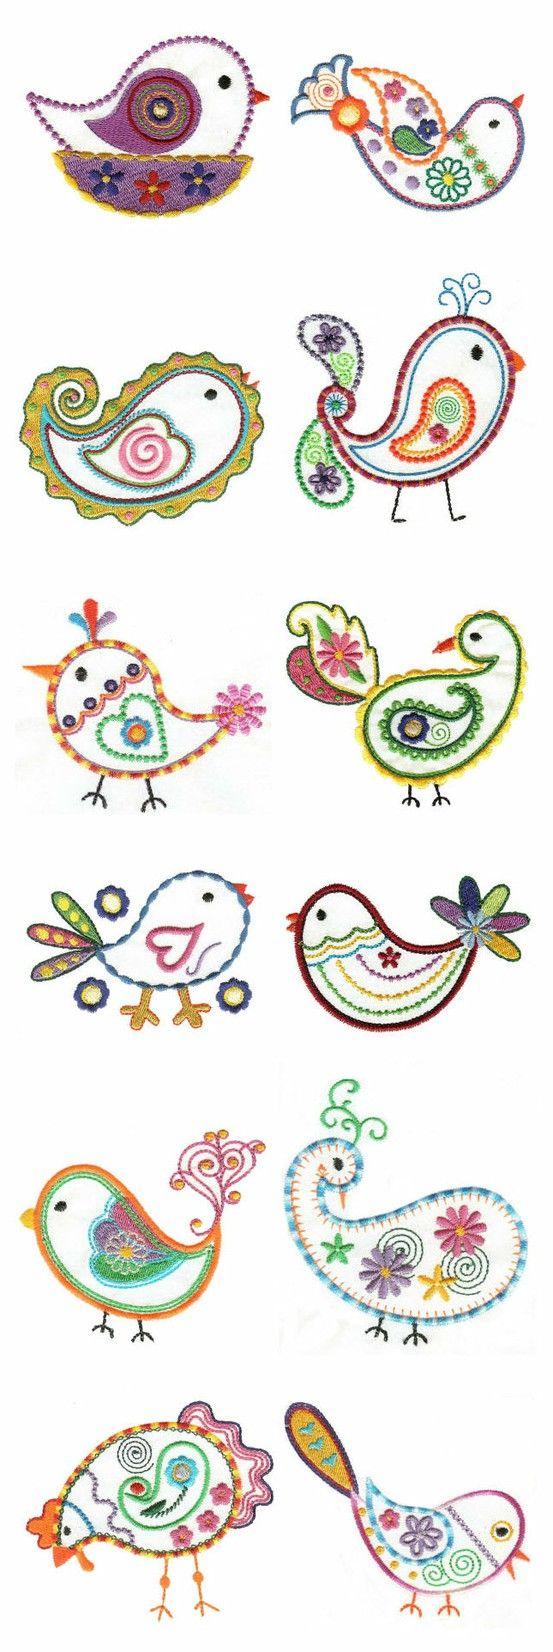 birds to embroider | Patrones De Bordado | Pinterest | Bordado ...